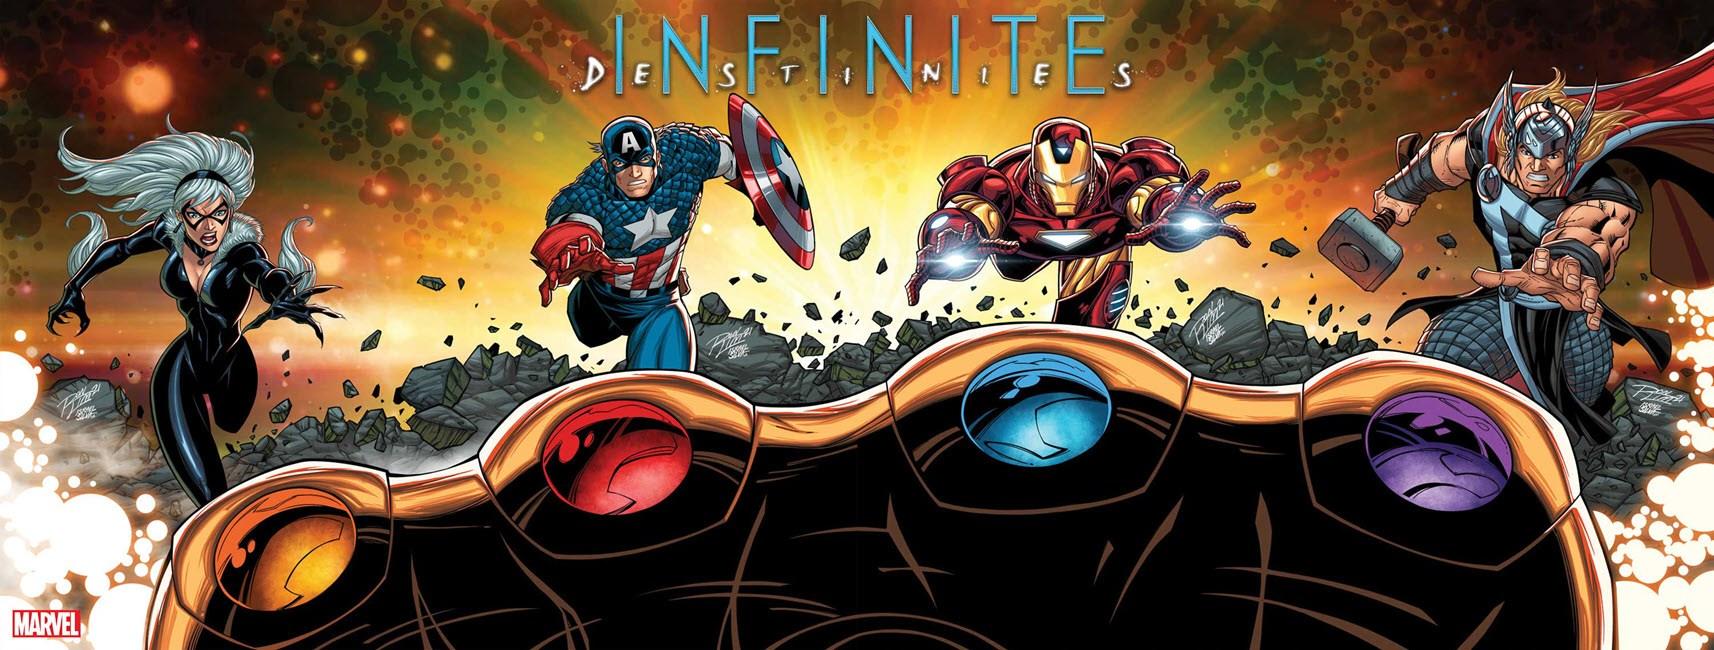 Marvel's 2021 infinite destinies crossover